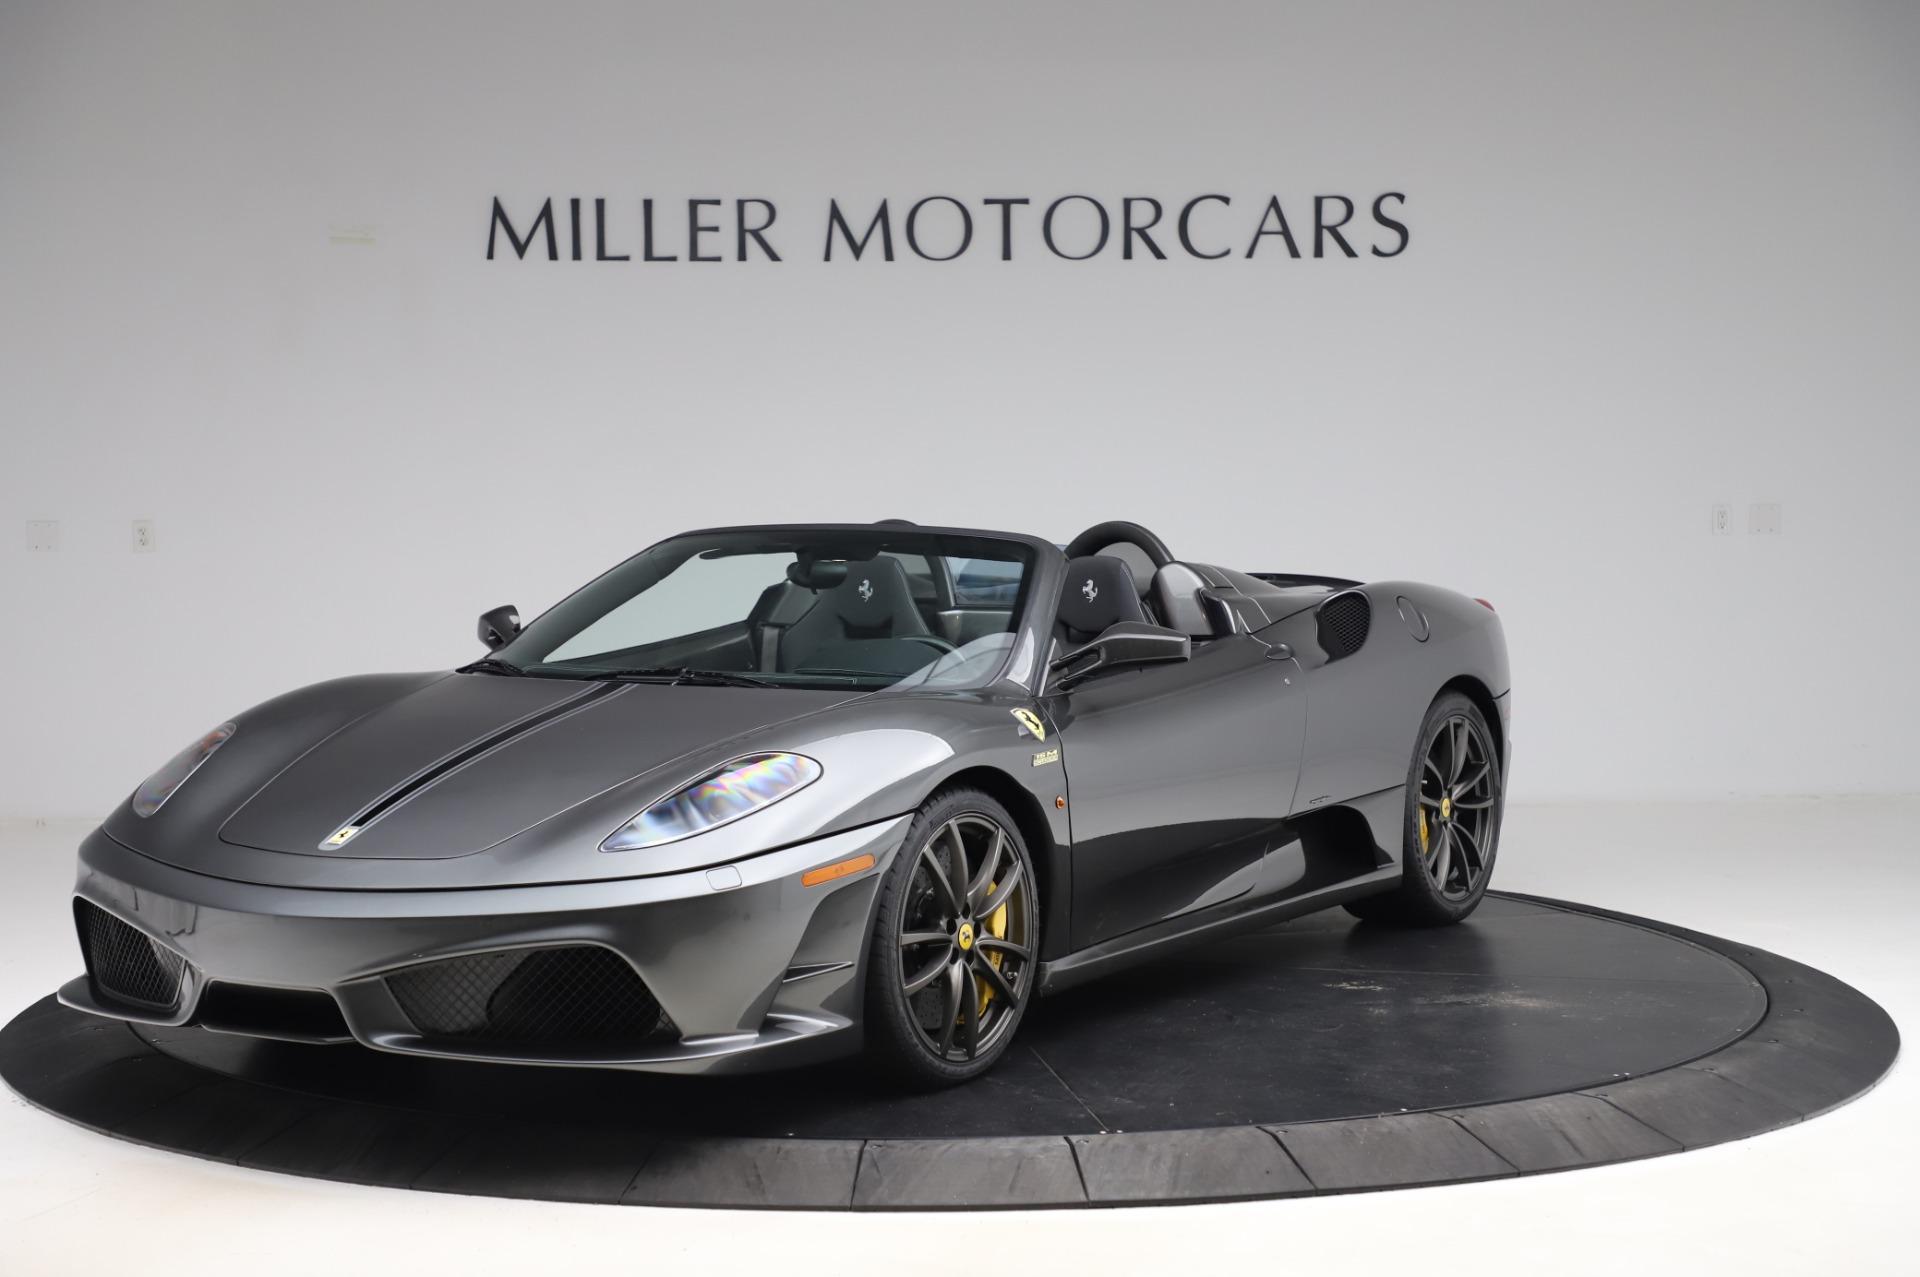 Used 2009 Ferrari 430 Scuderia Spider 16M for sale $325,900 at McLaren Greenwich in Greenwich CT 06830 1